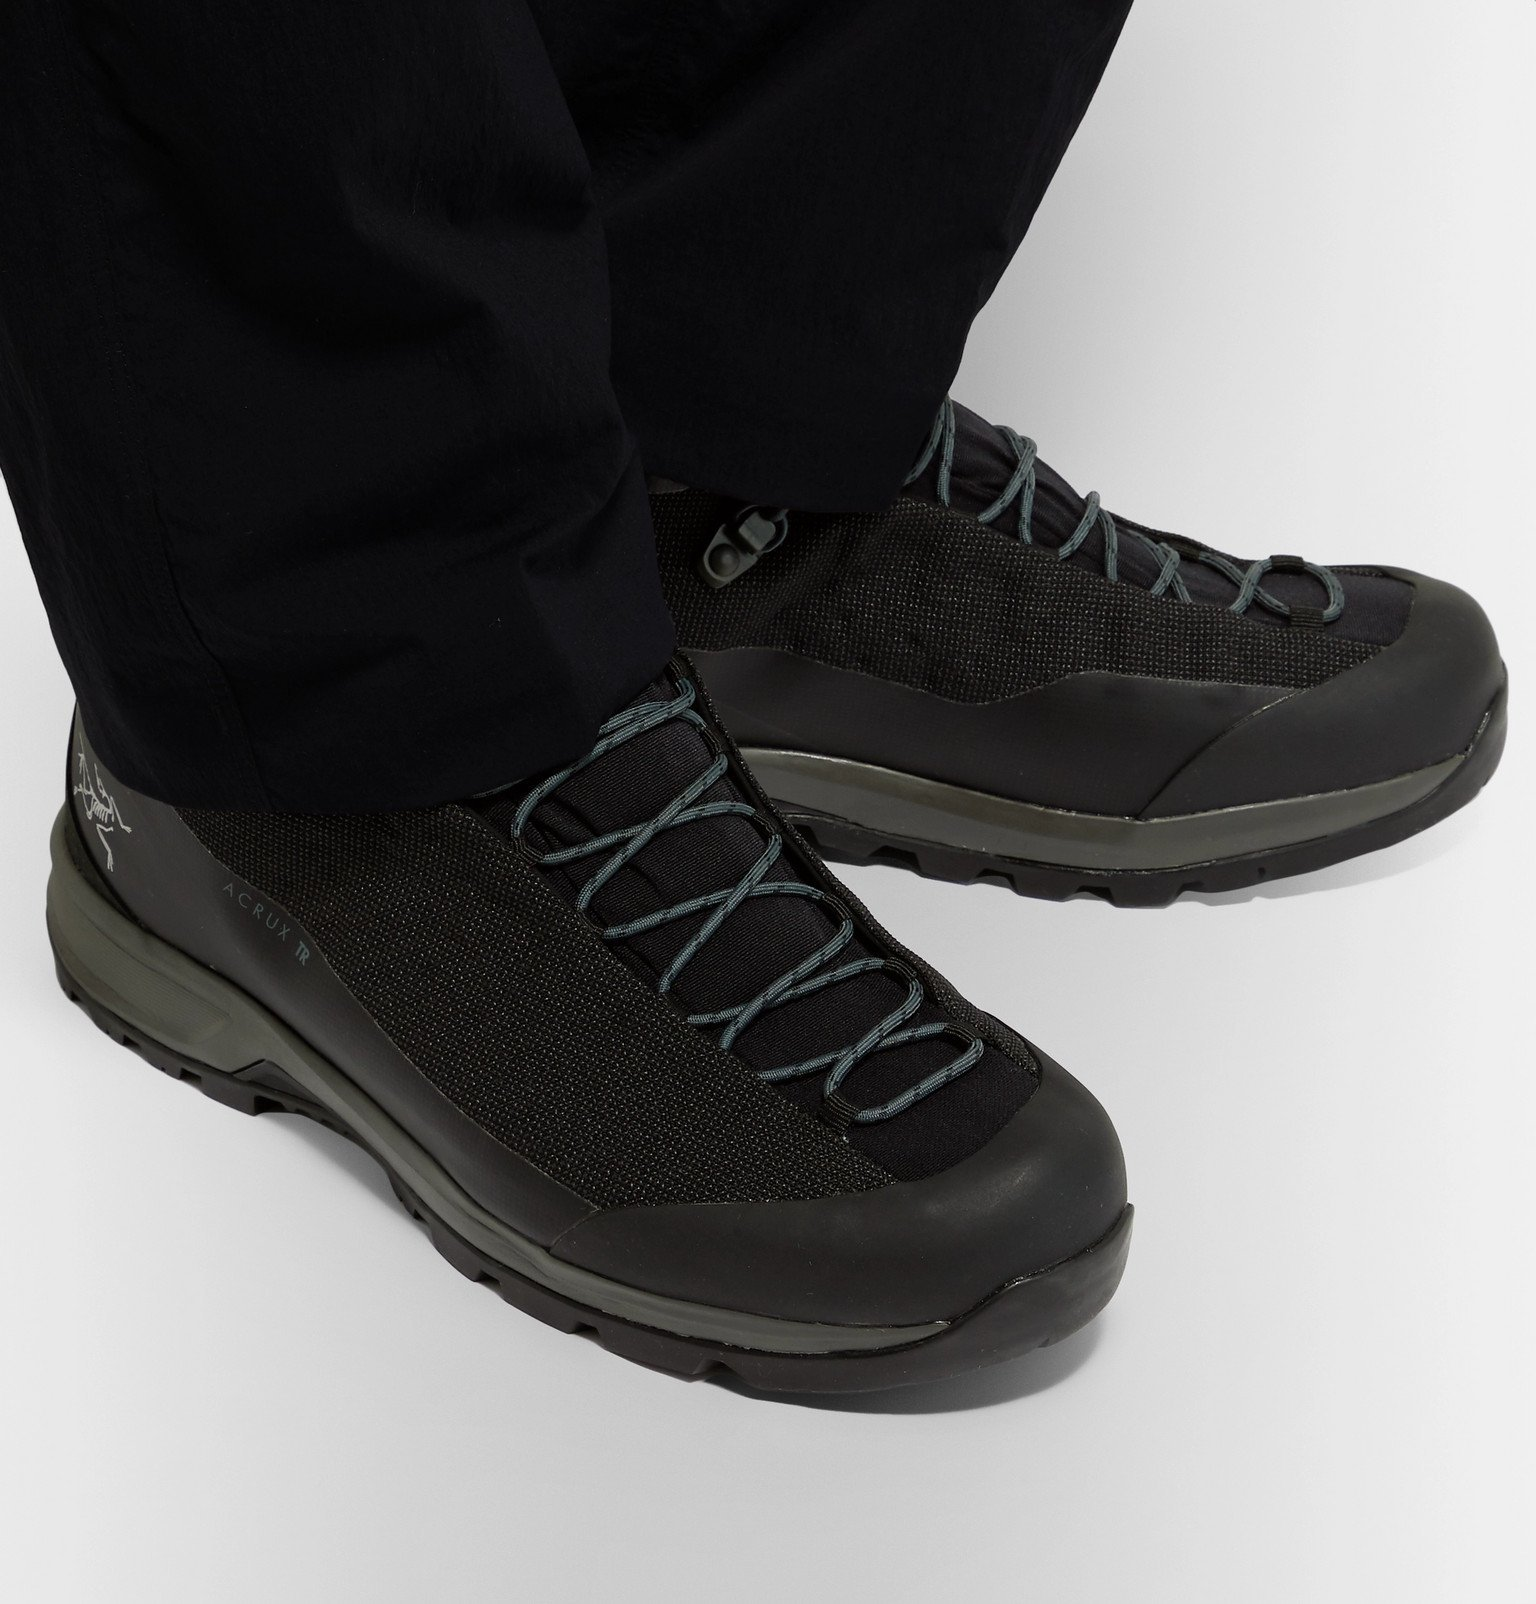 Arc'teryx - Acrux TR GTX Rubber-Trimmed SuperFabric Hiking Boots - Black